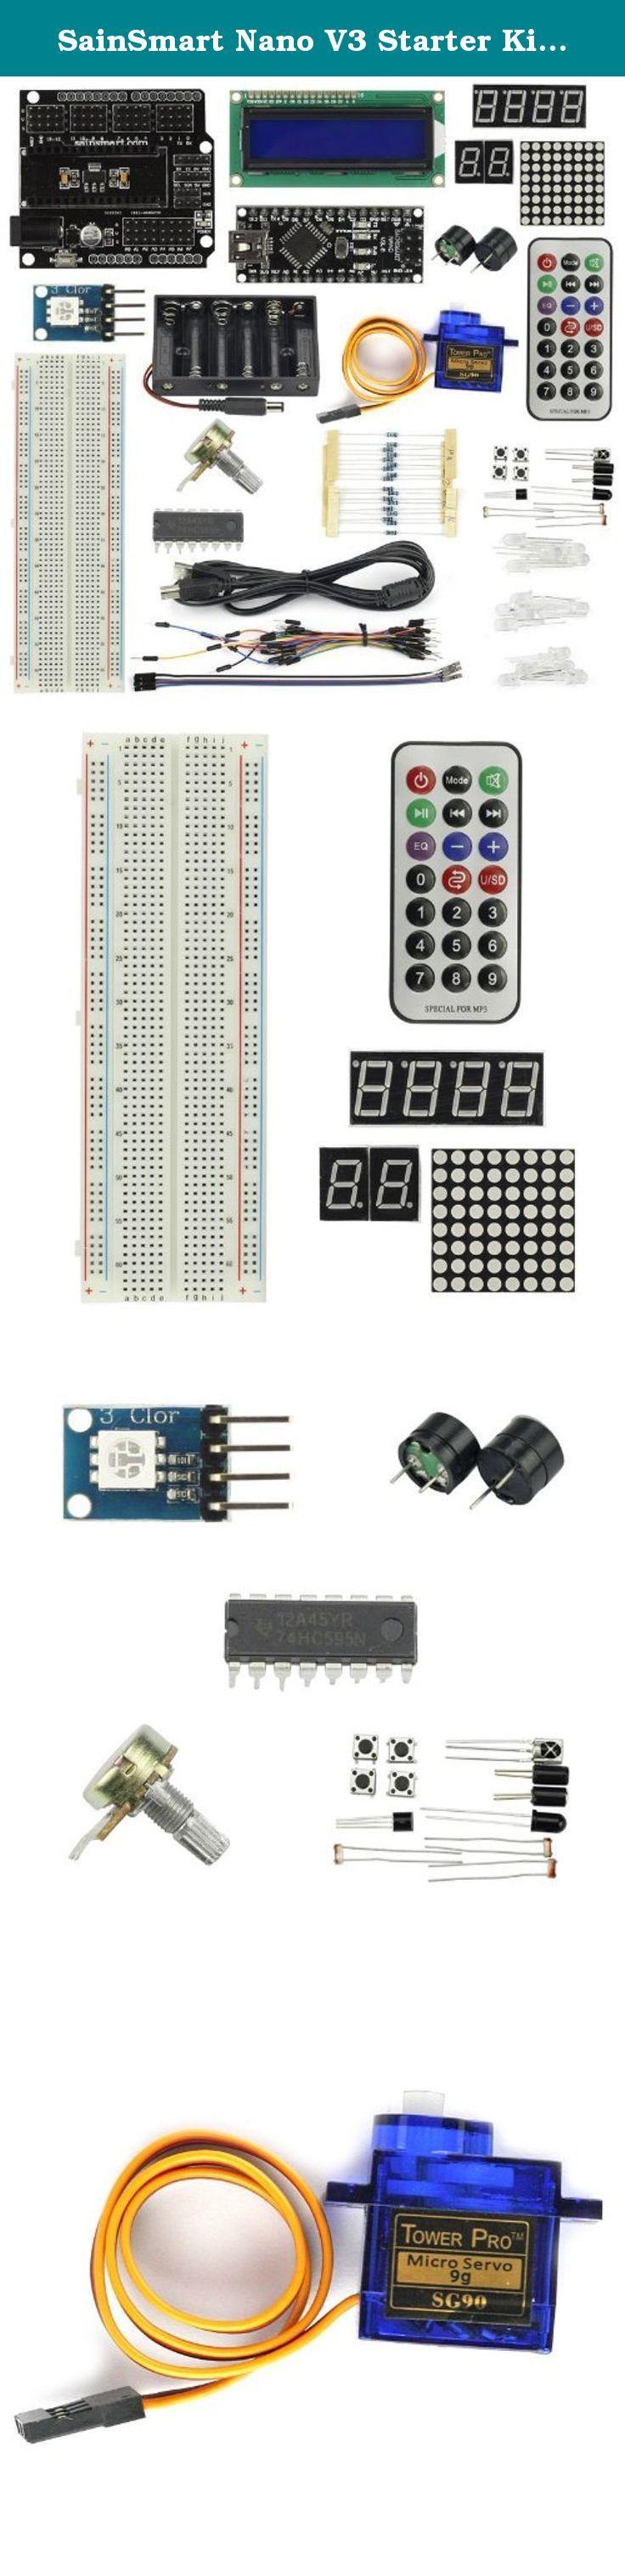 b4fb212a51e62e73688528dfb9120b80 arduino projects starter kit